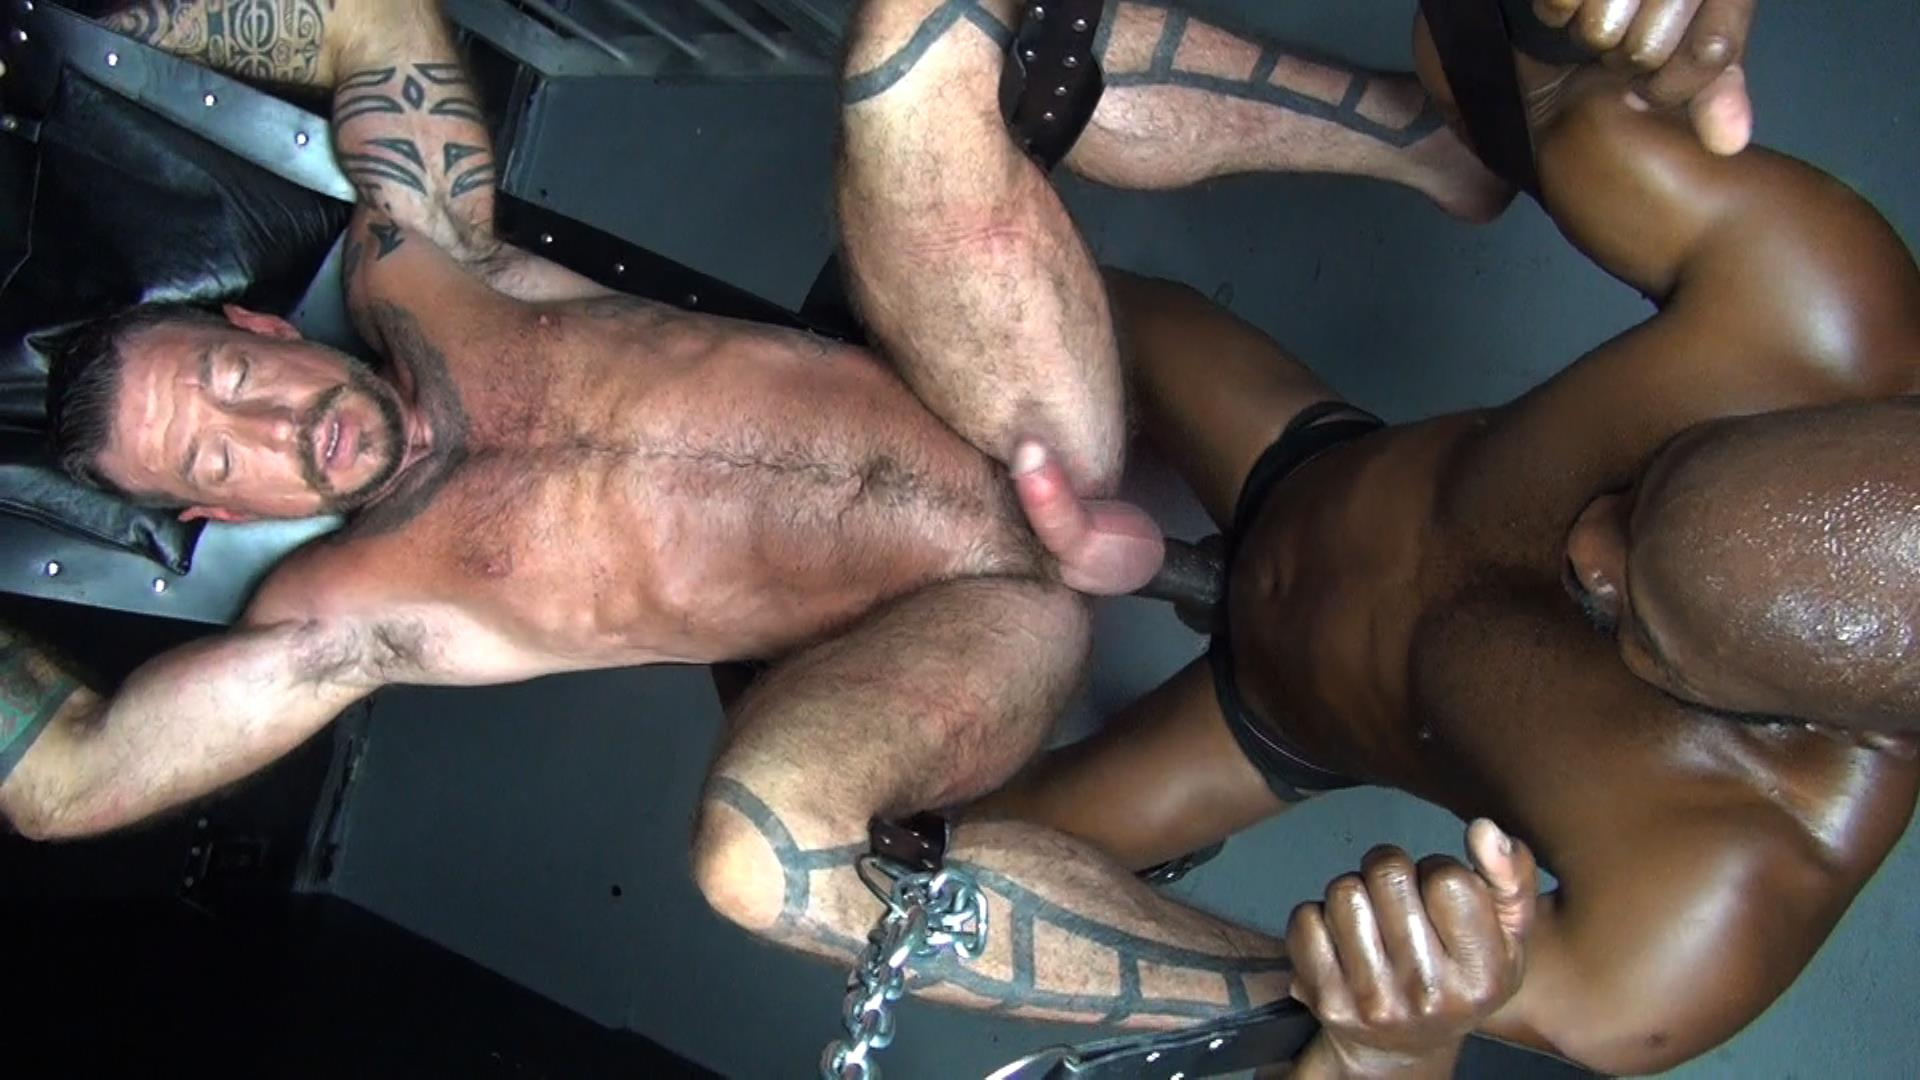 Raw-Fuck-Club-Cutler-X-and-Ray-Dalton-Interracial-Bareback-Sex-Amateur-Gay-Porn-2 Cutler X Barebacking Hairy Muscle Daddy Ray Dalton With His Big Black Cock